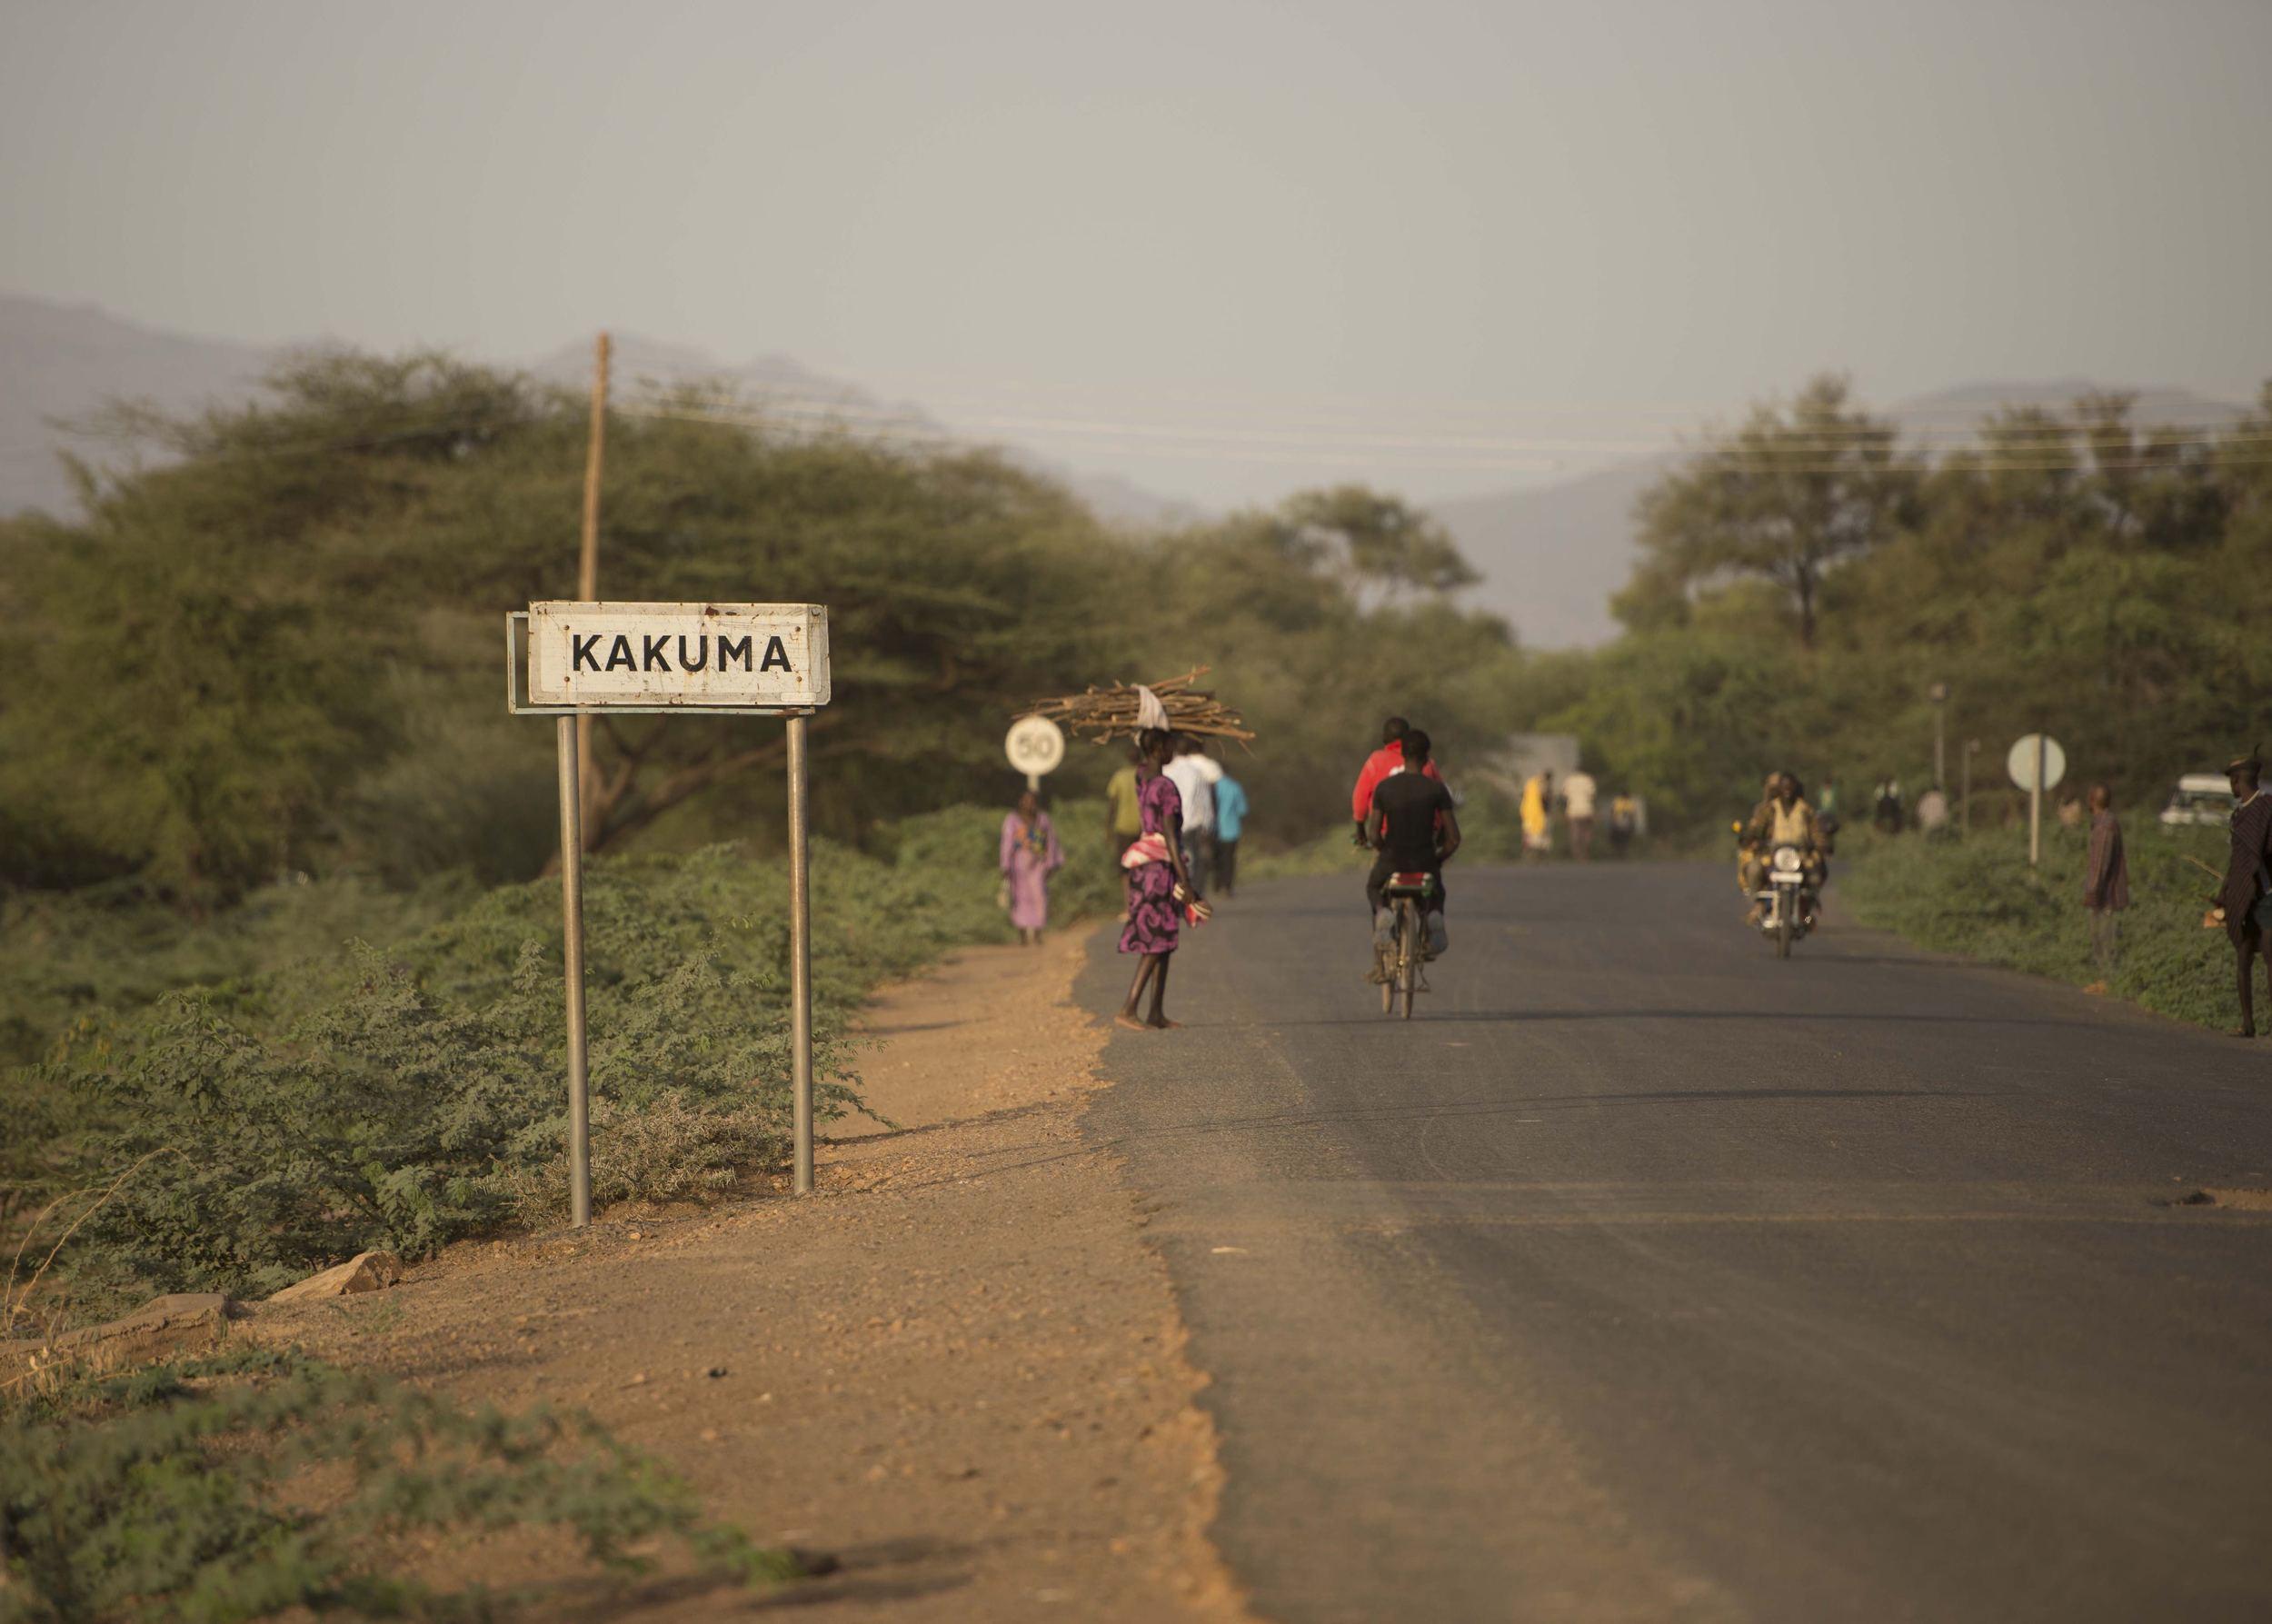 This is Kakuma image: Jjumba Martin